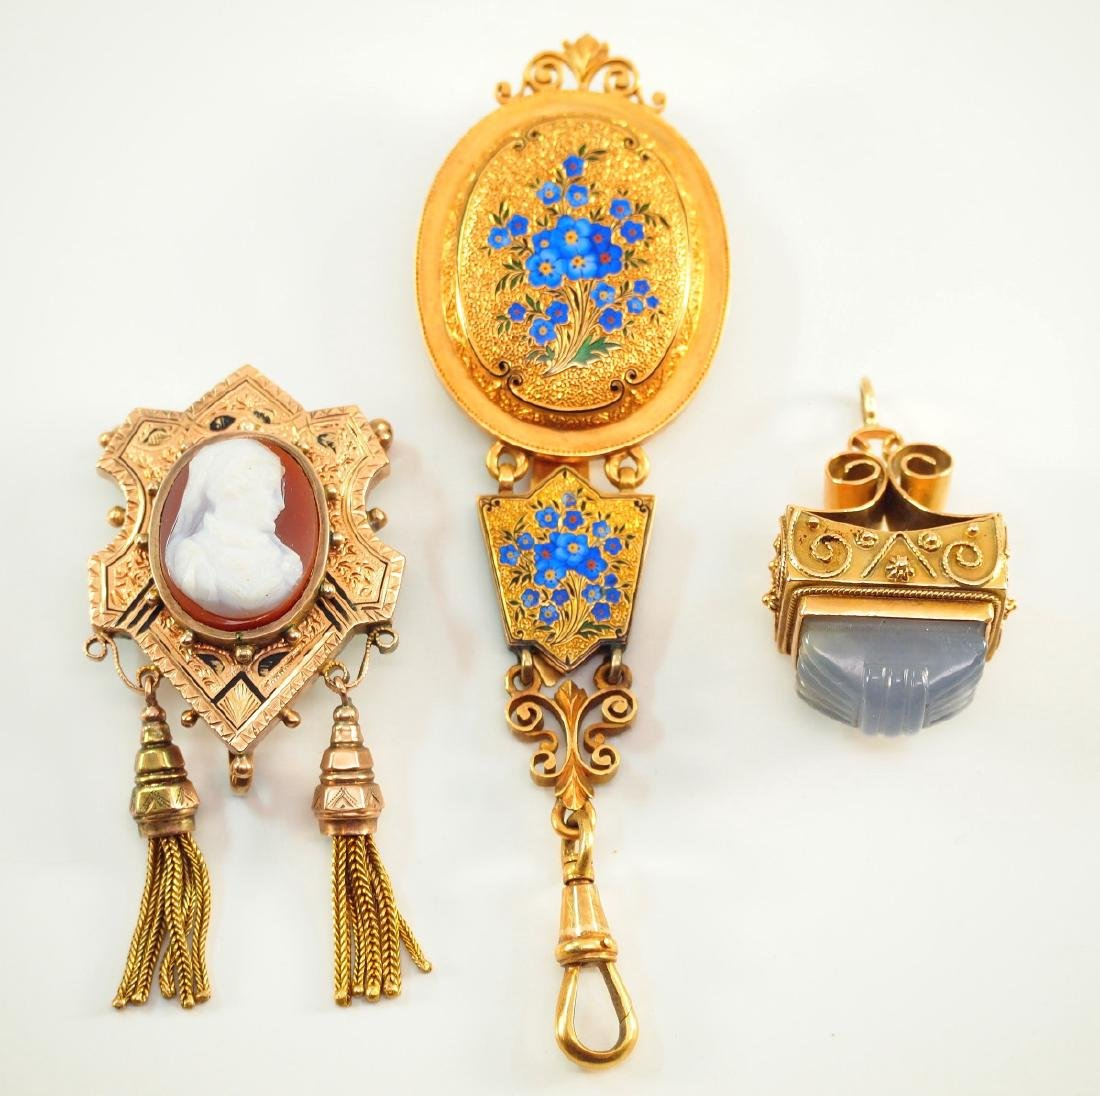 3 Victorian Gold Accessories